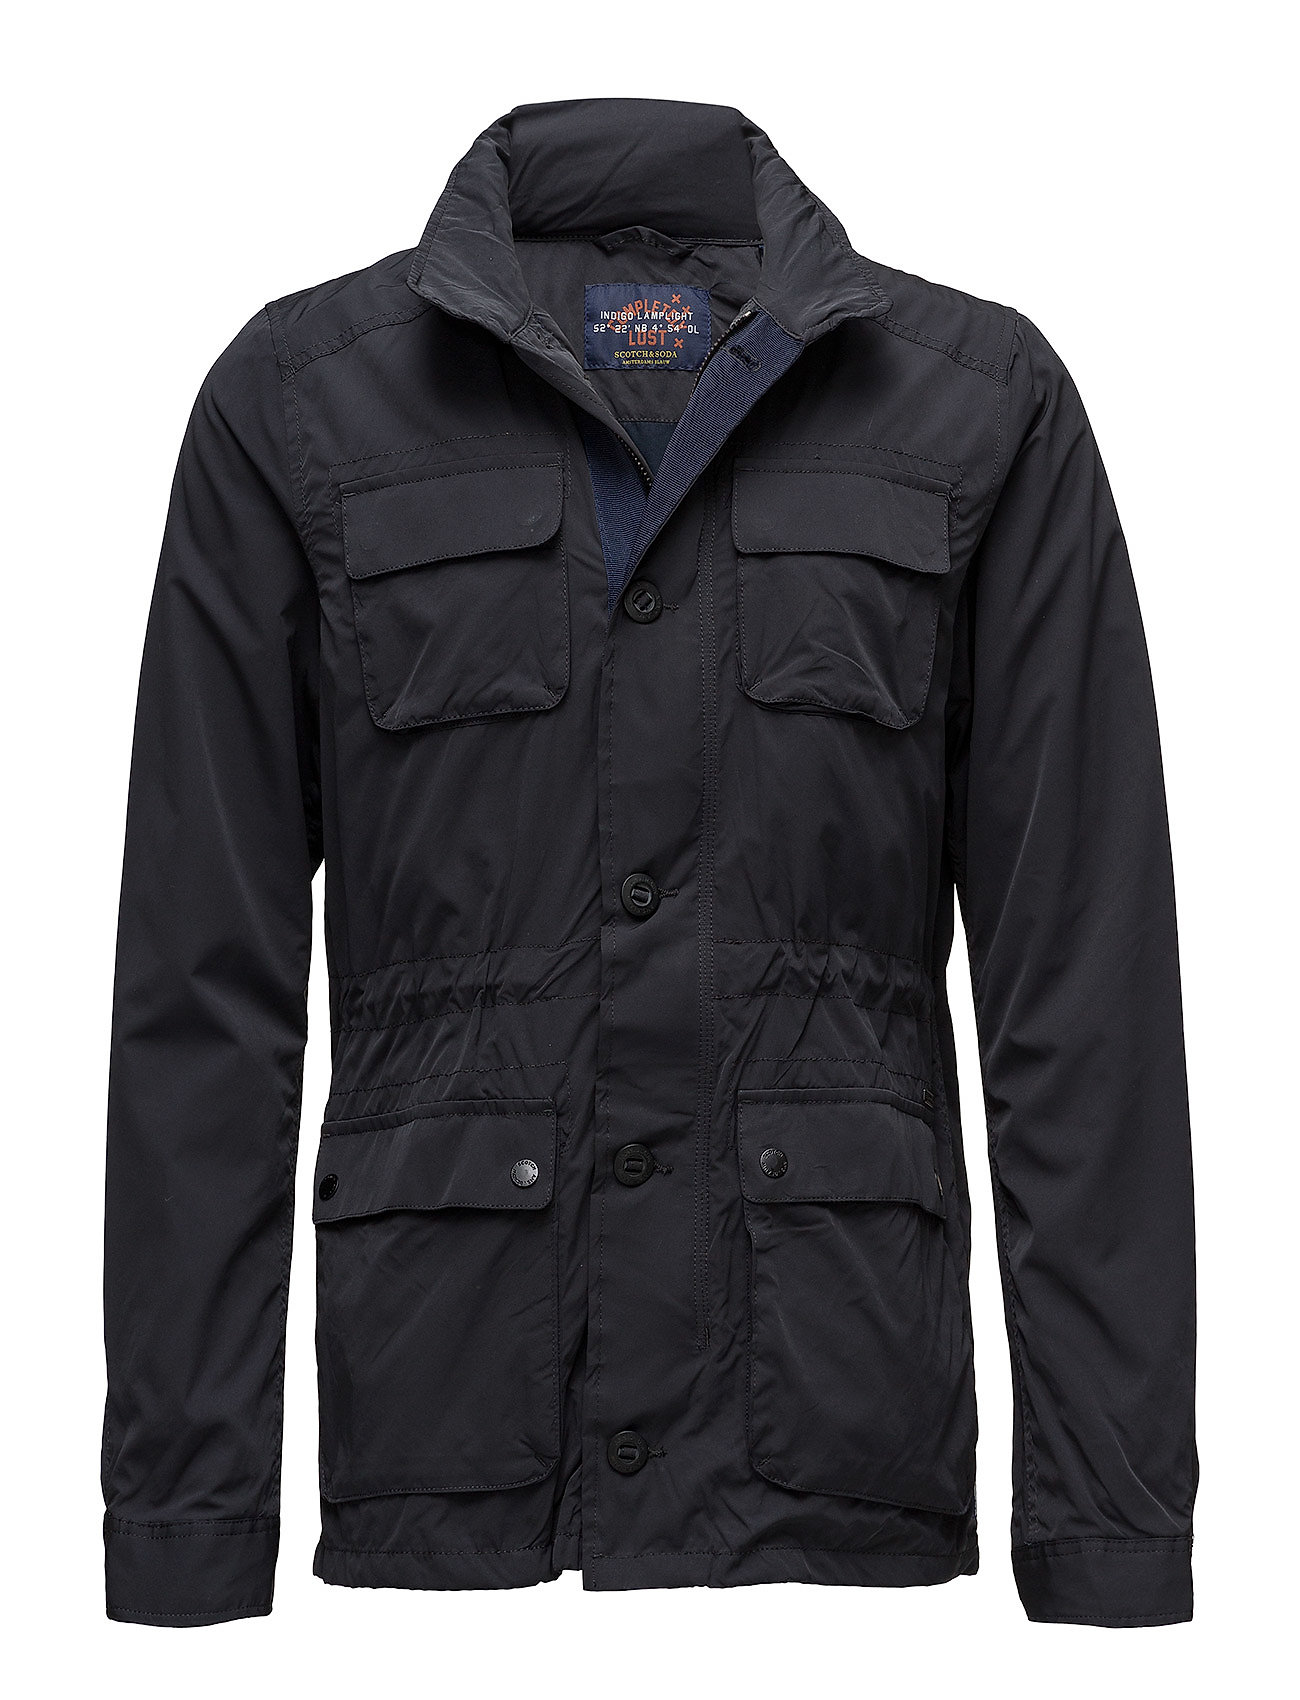 Scotch & Soda Ams blåw 4 pocket military jacket Ytterkläder